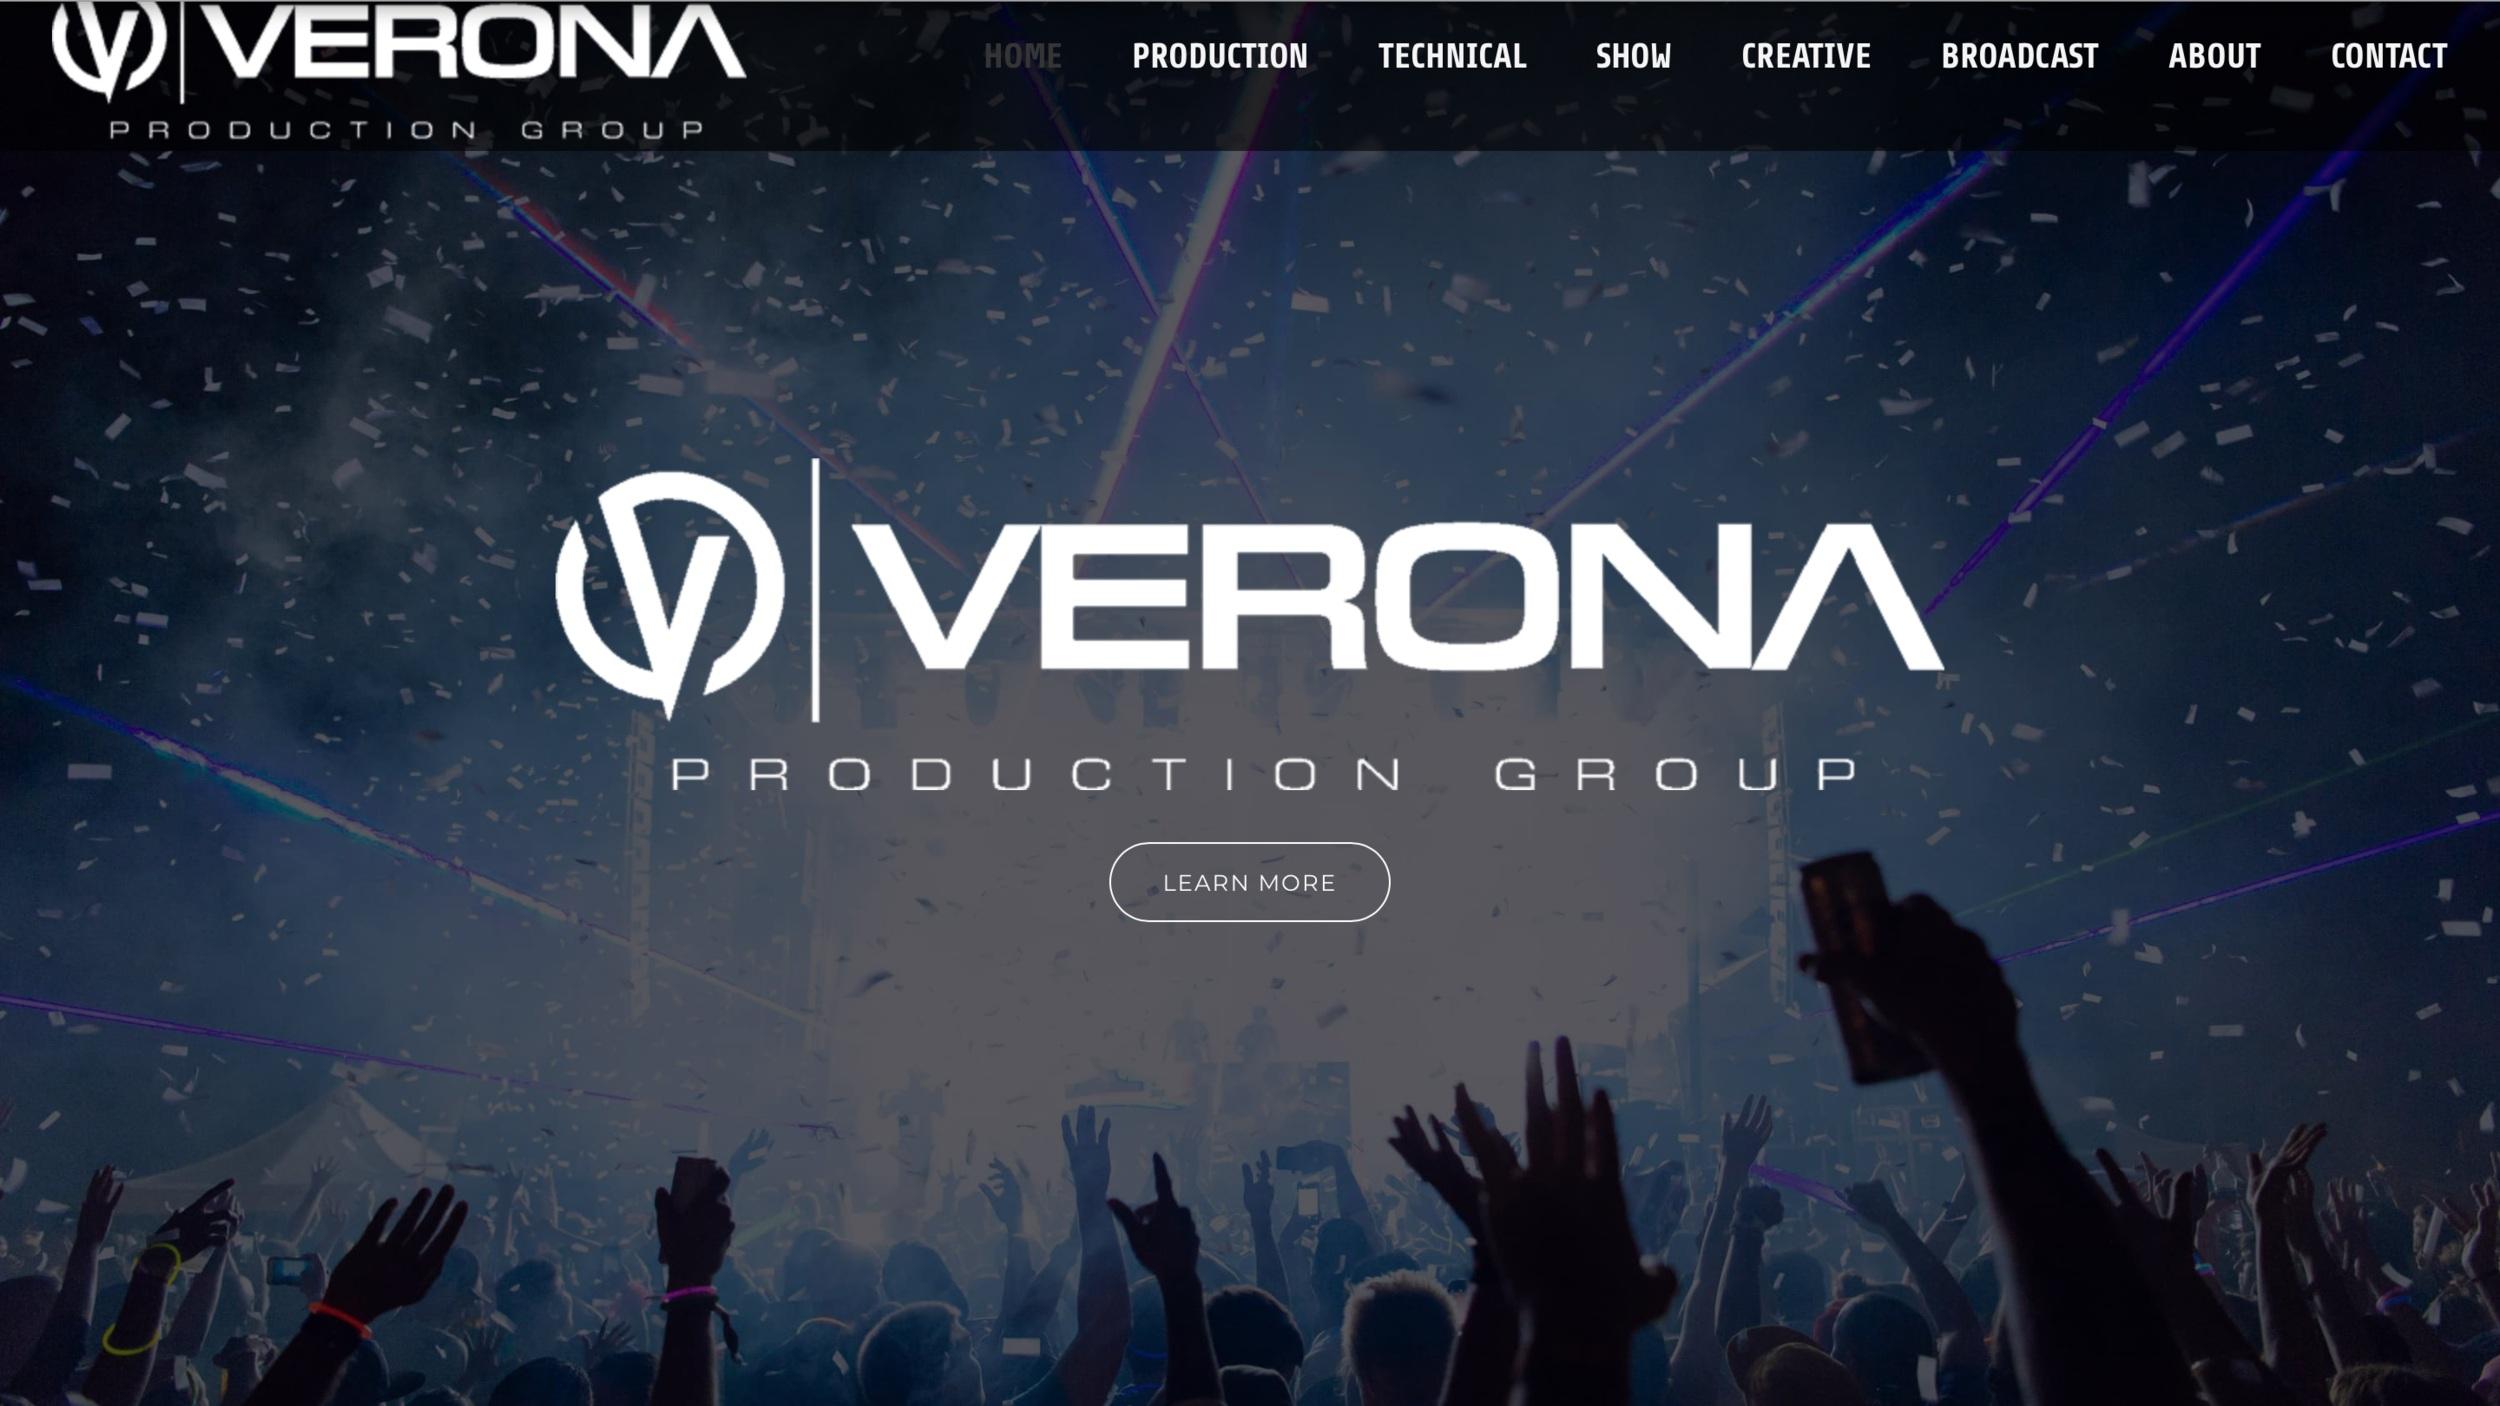 Web design for video production company Verona Production Group  http://veronapro.com